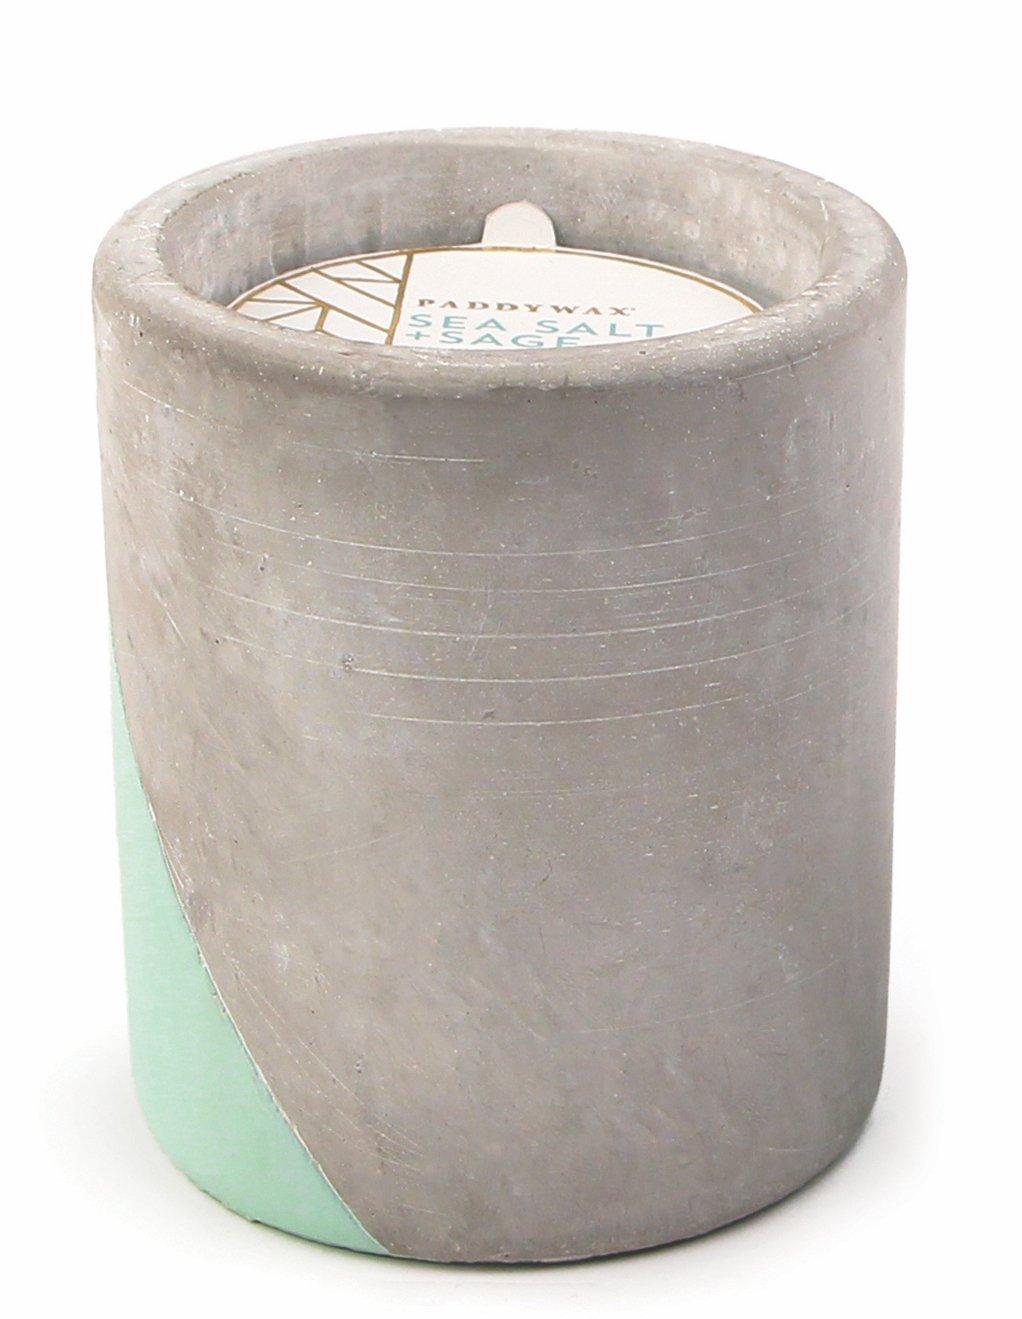 Paddywax Candles Urban Collection Soy-Blend Wax, 12oz, Sea Salt + Sage